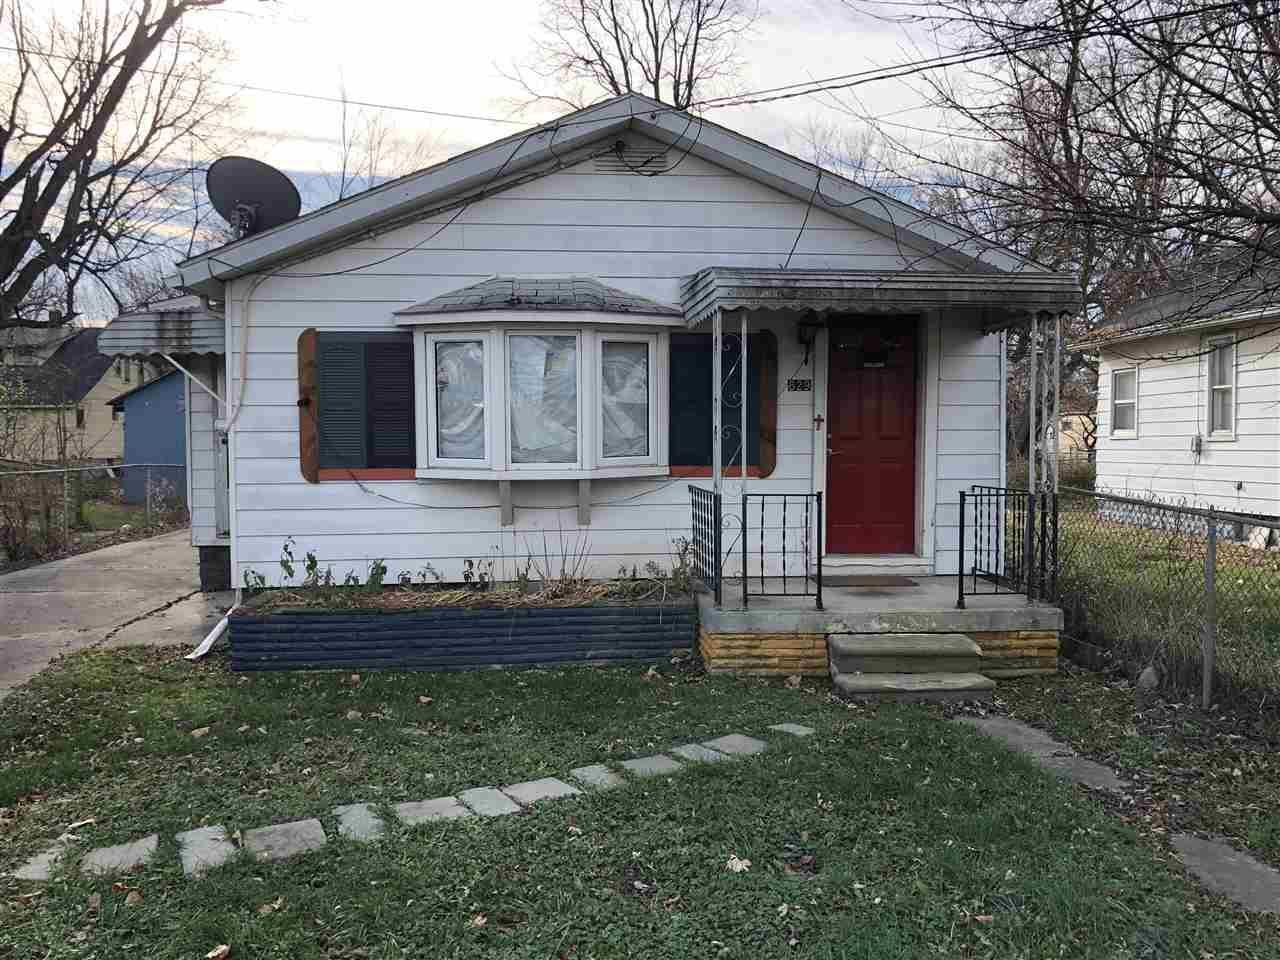 829 Campbell, Flint, MI 48507 - #: 50030608